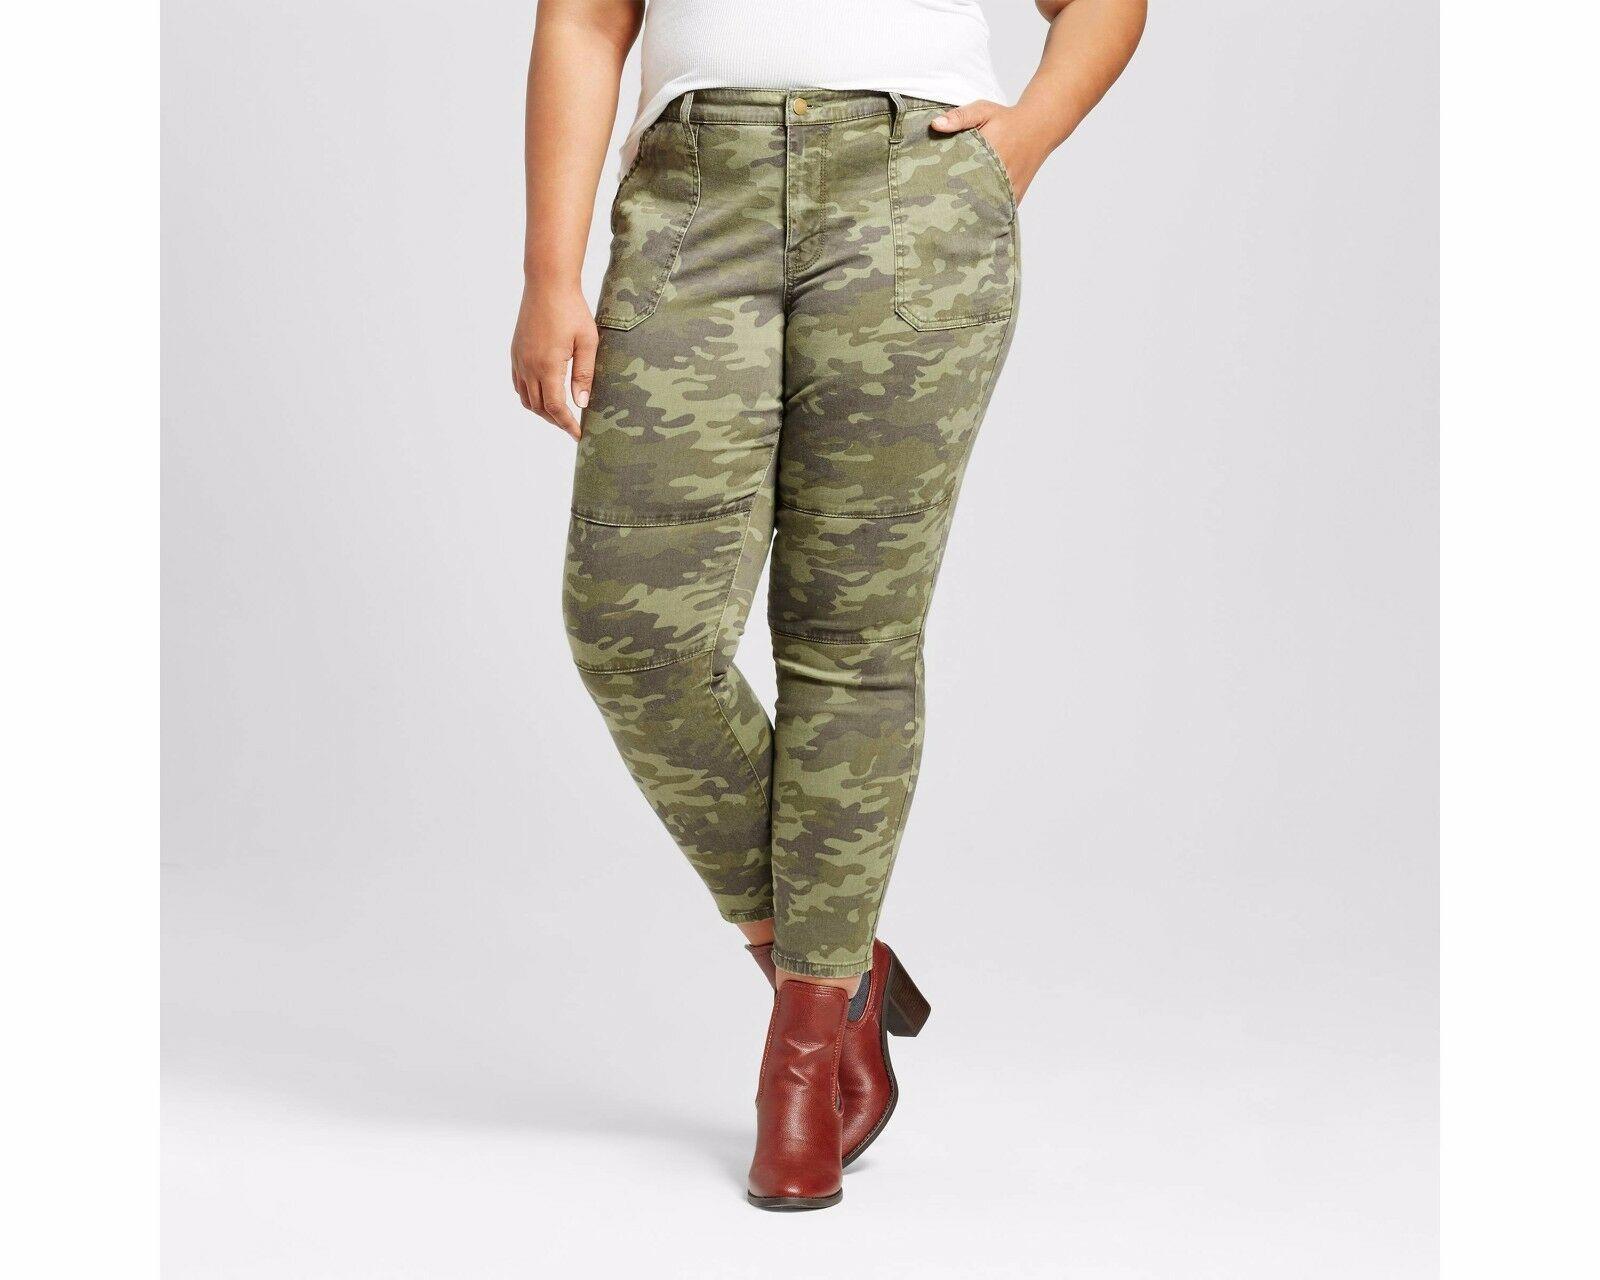 Ava /& Viv Women/'s Plus Size Stretch Skinny Jeans Olive Color Various Sizes